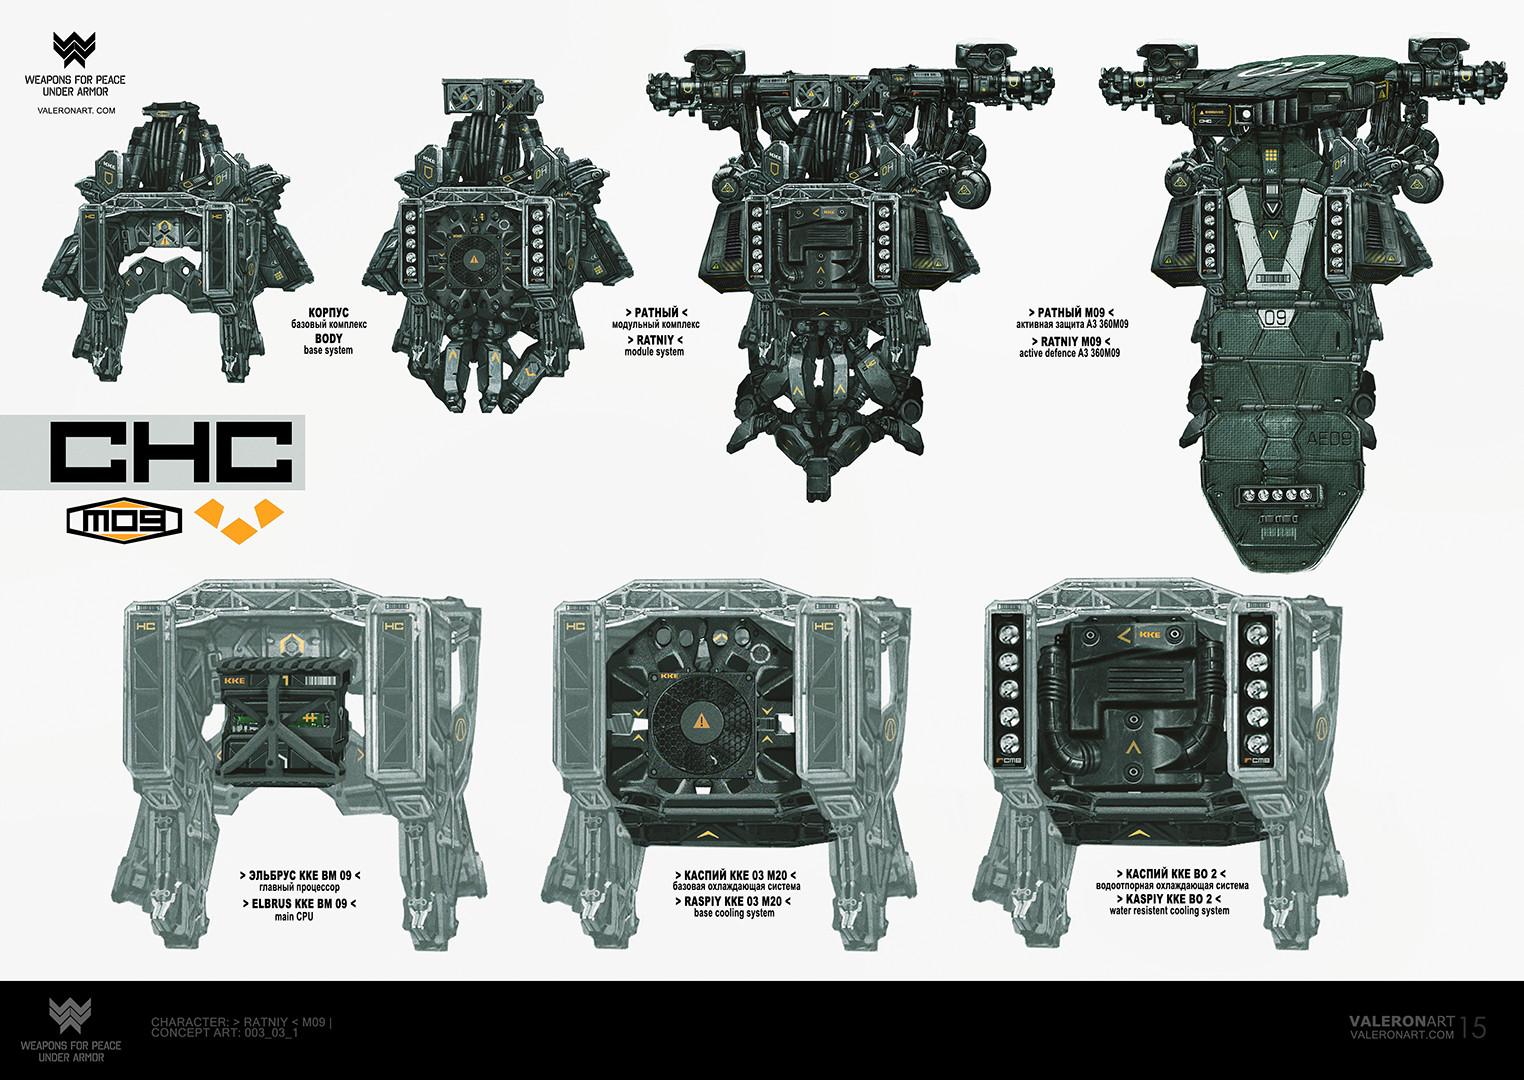 Val orlov 006 wpf ratniy concept 004